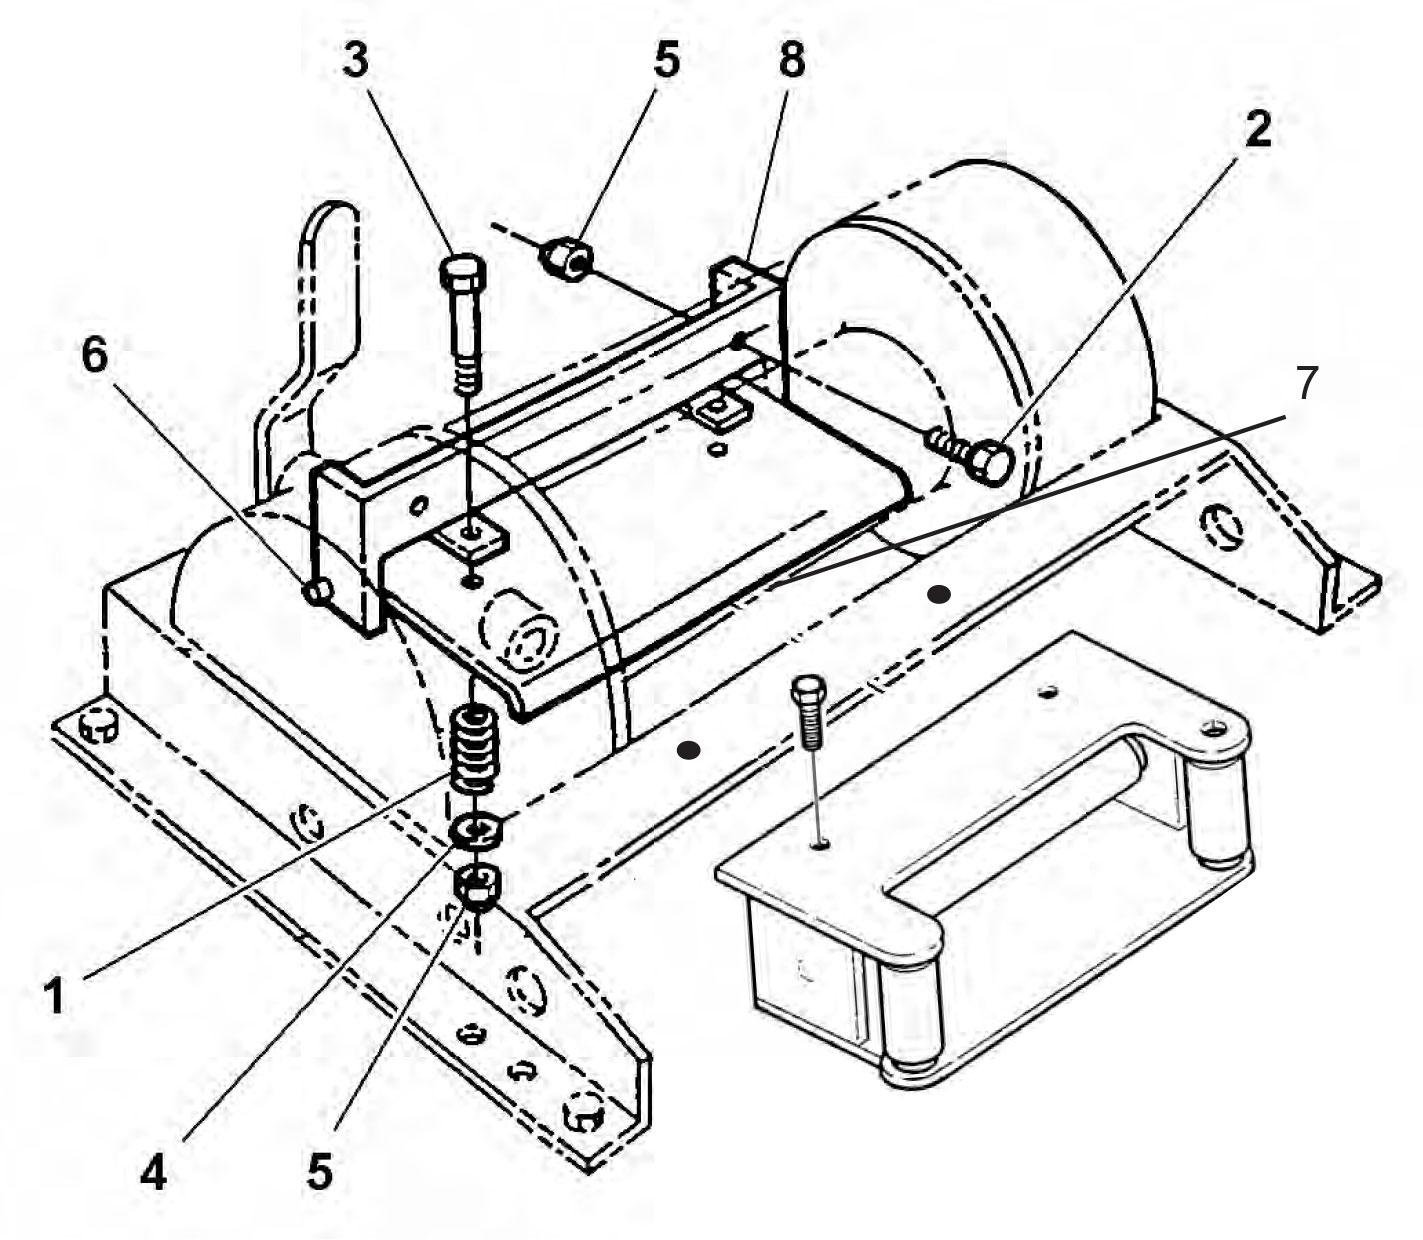 Old Ramsey Winch Switch Wiring Diagram Auto Electrical Warn M12000 Fashioned Motif